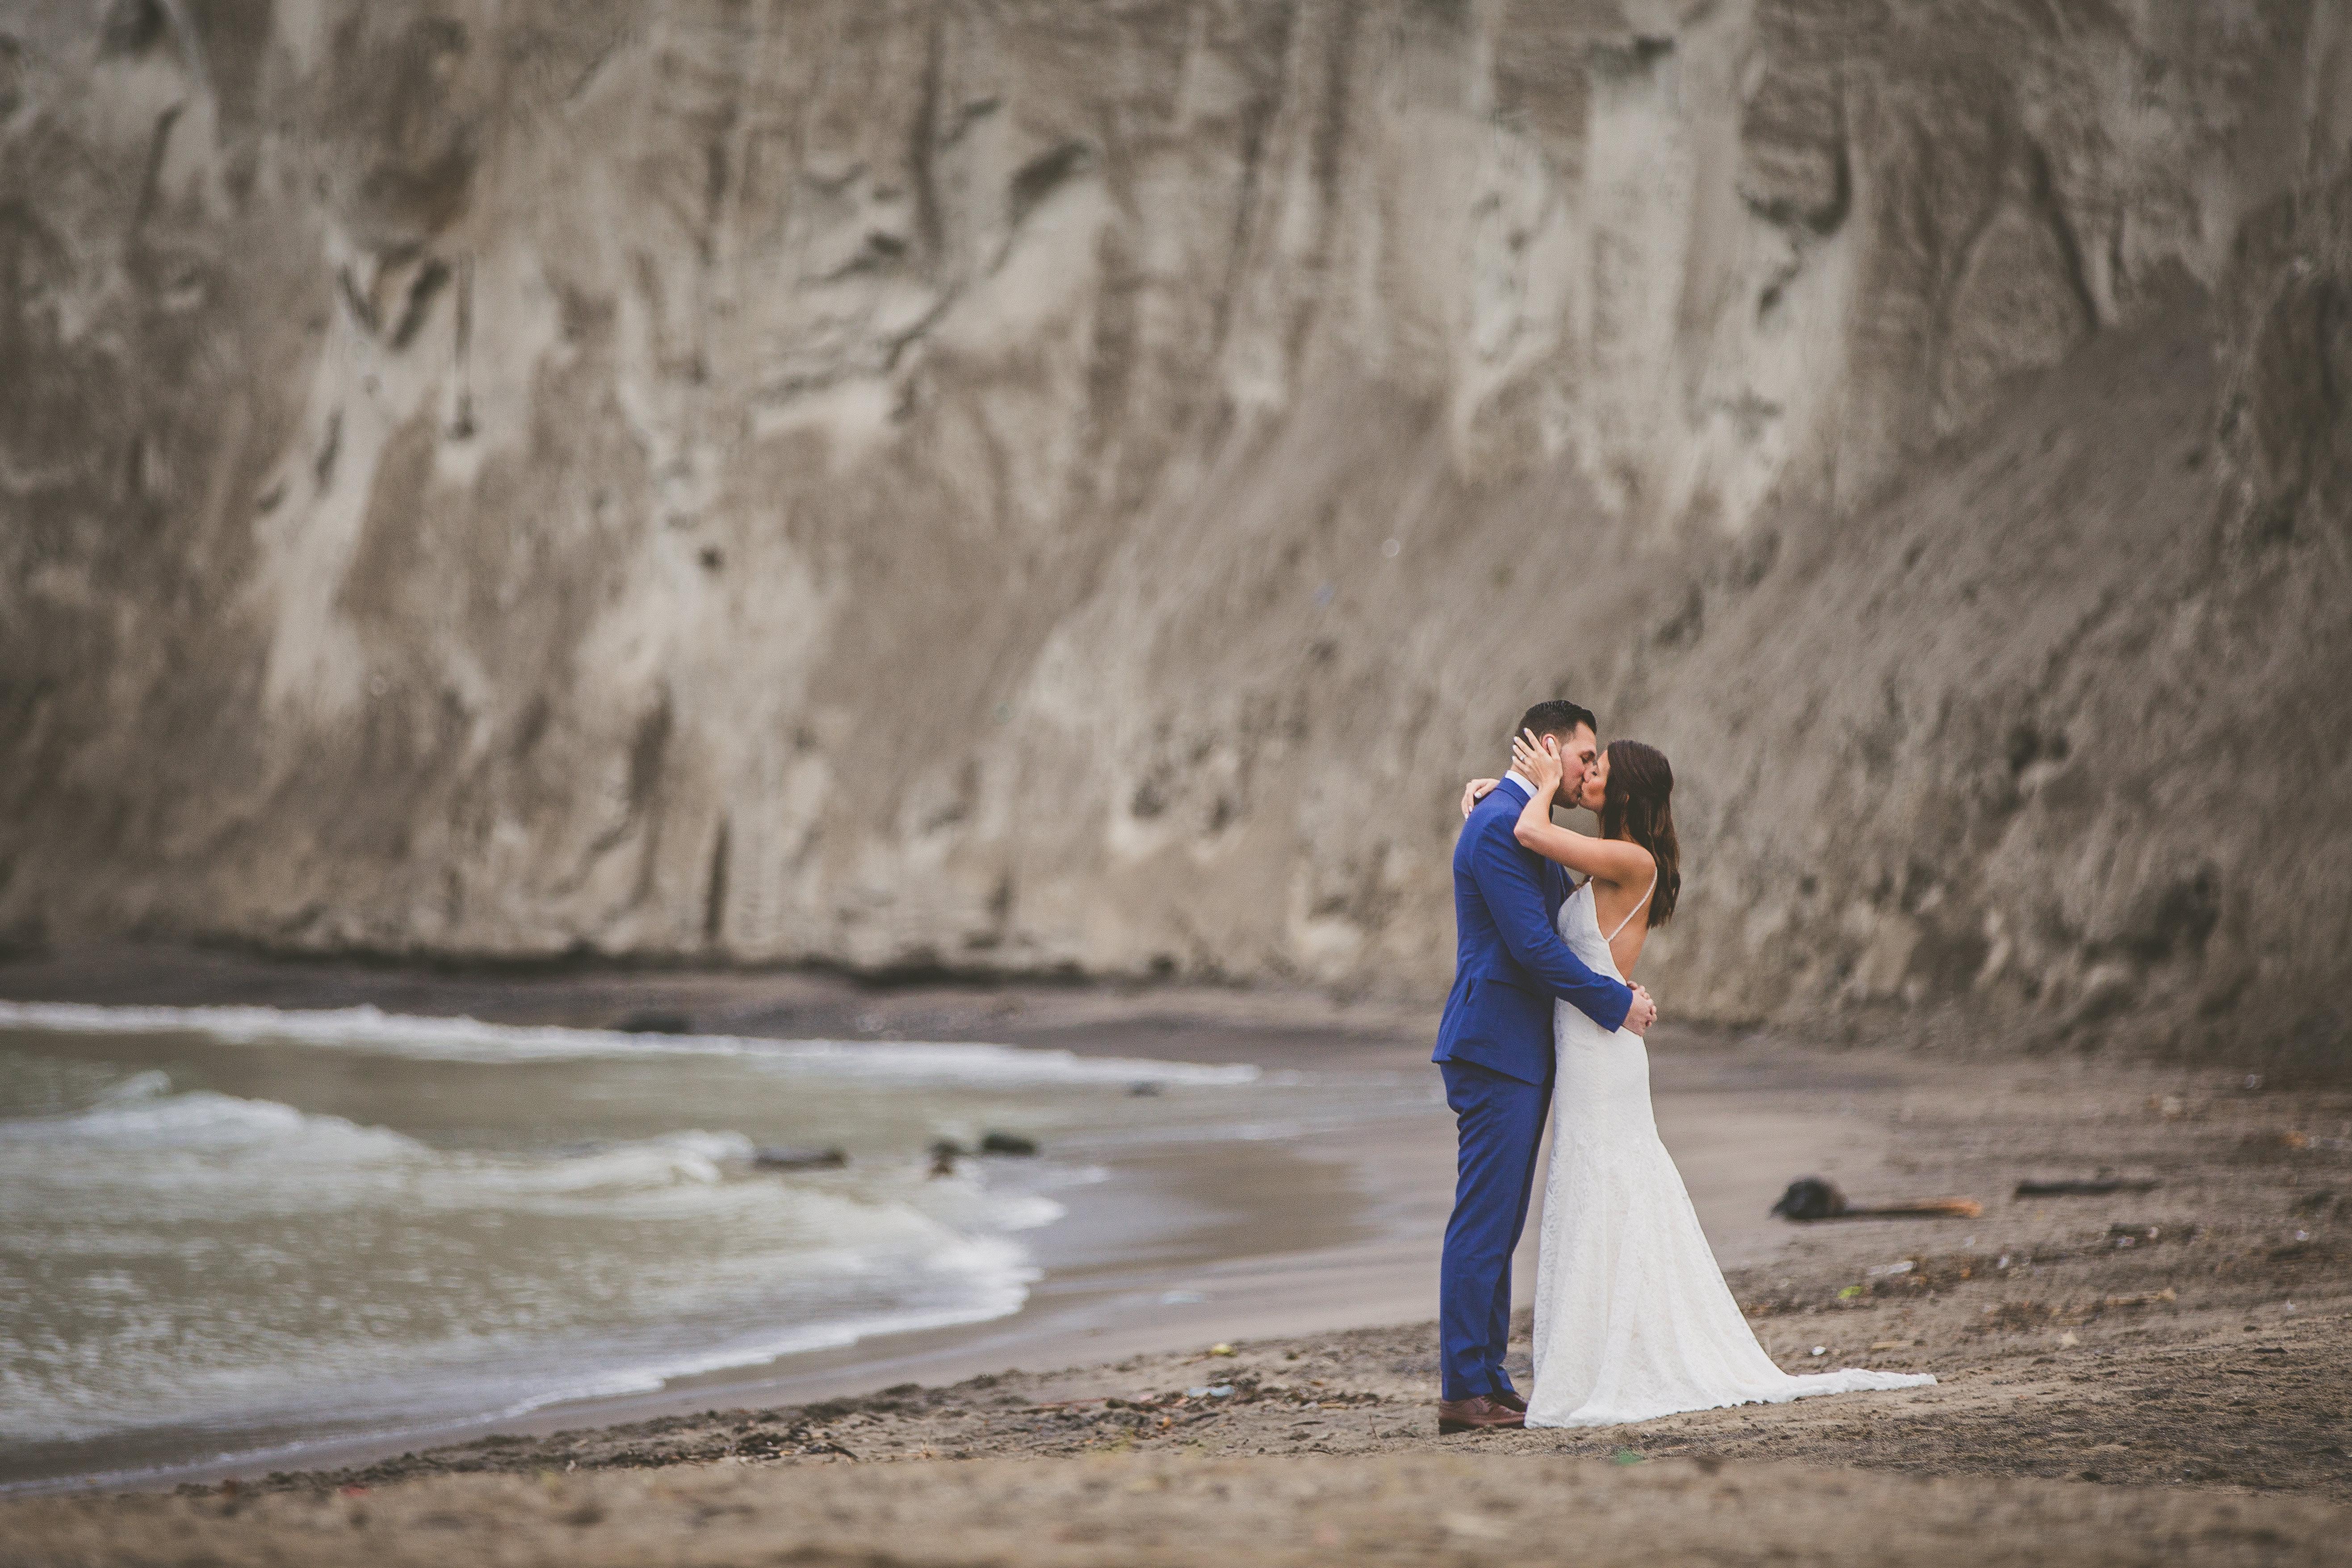 scarborough bluffs wedding photos 47 - Scarborough Bluffs Wedding Photos